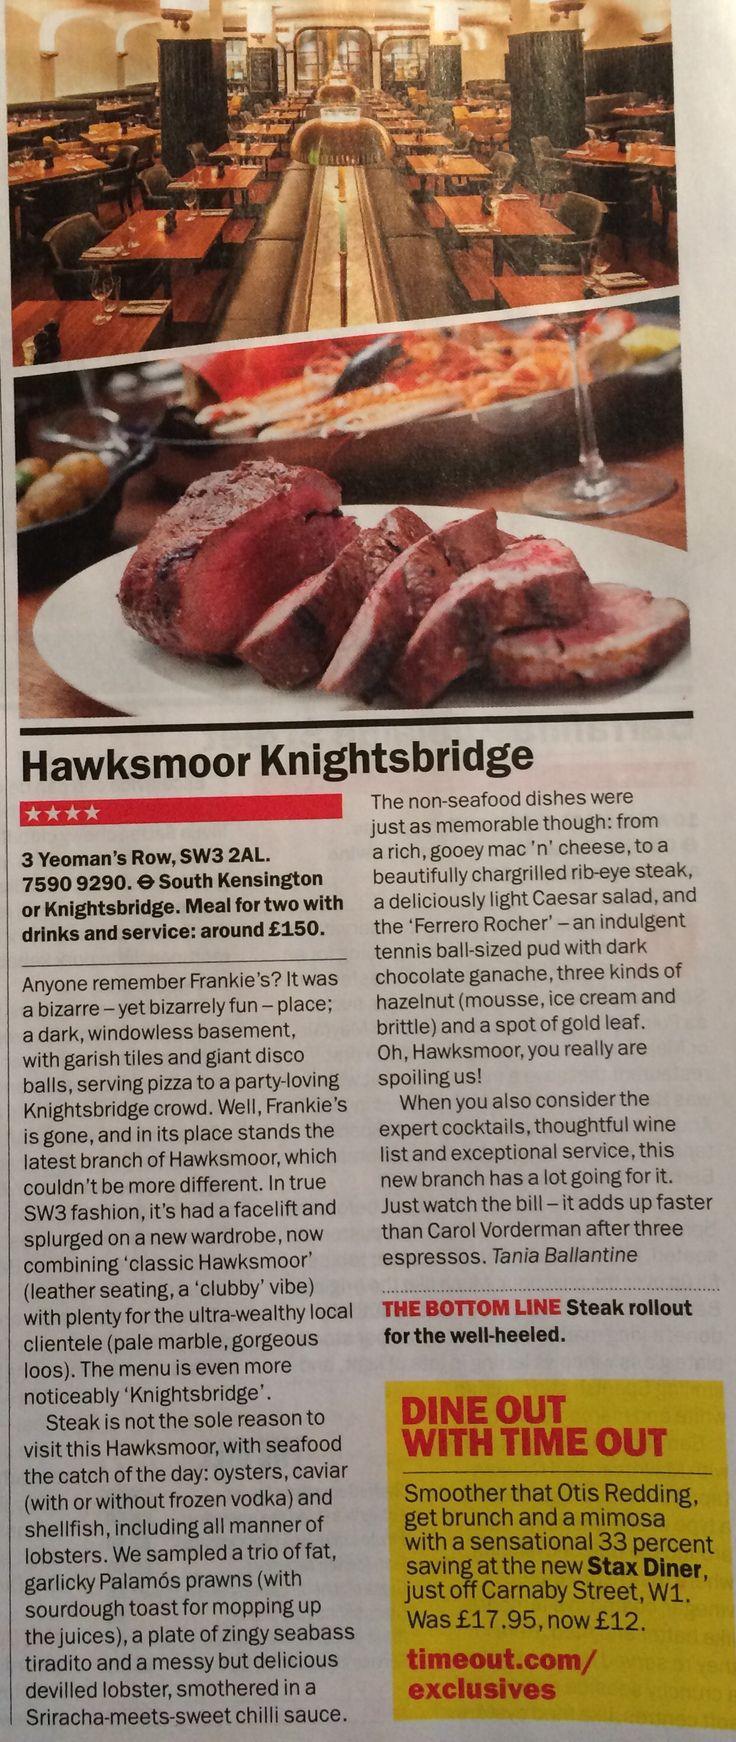 Hawksmoor Knightsbridge #hawksmoor #knightsbridge #London #hawksmoorknightsbridge #steak